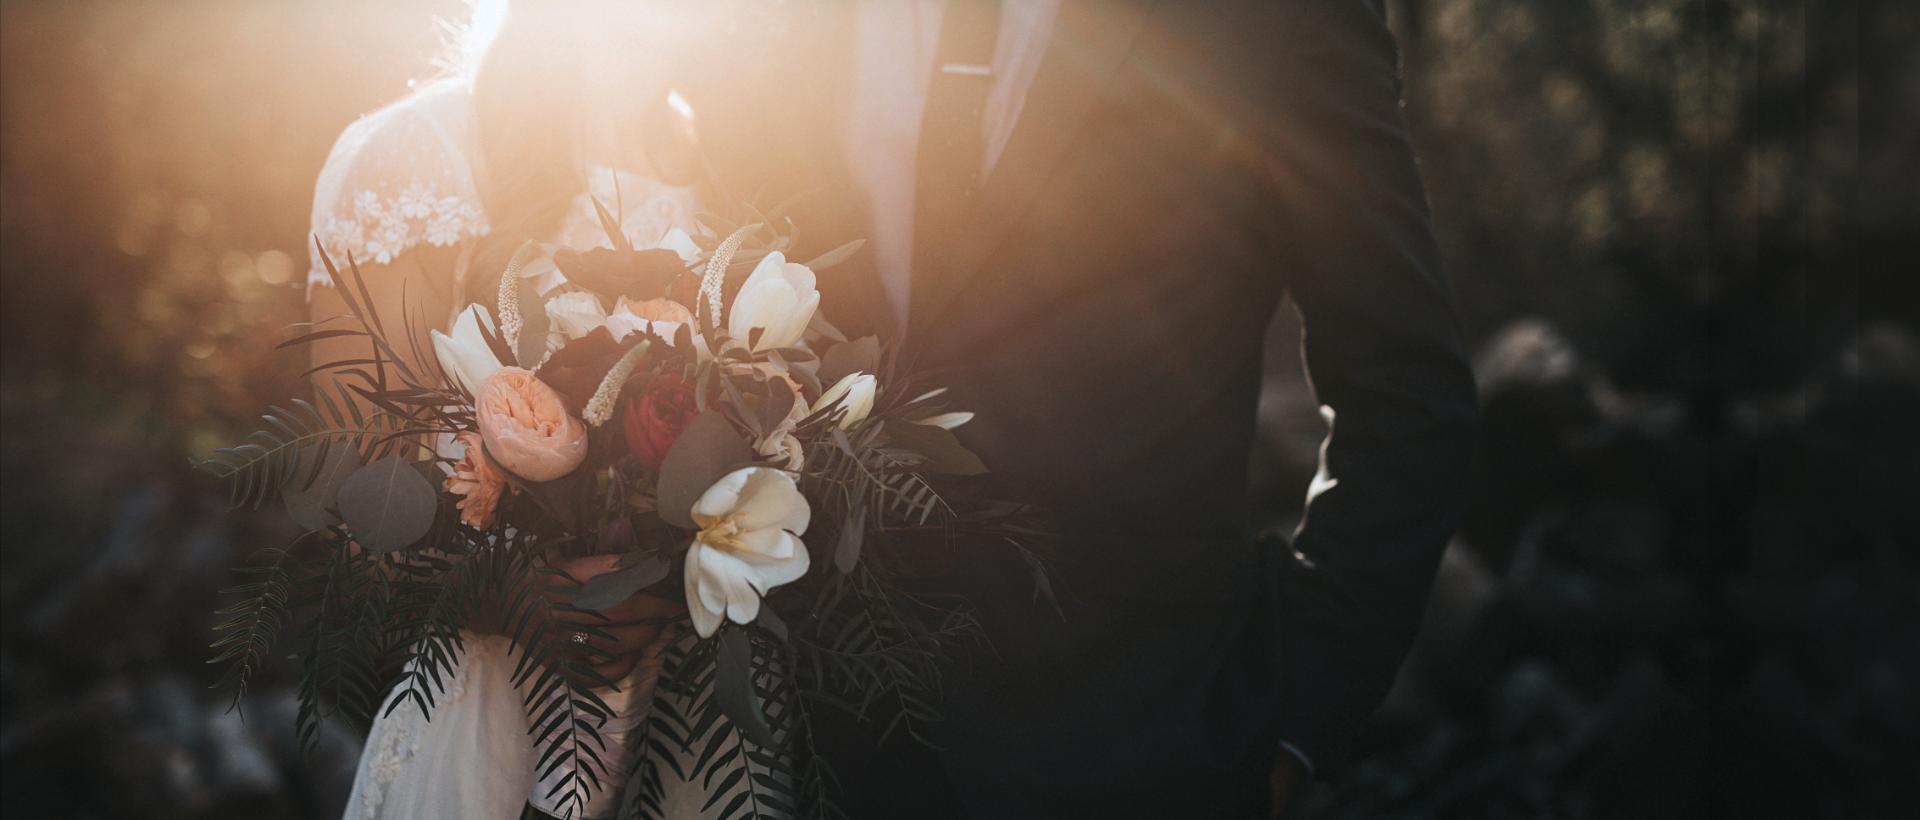 Marriage - wedding photo in dusty sunlight